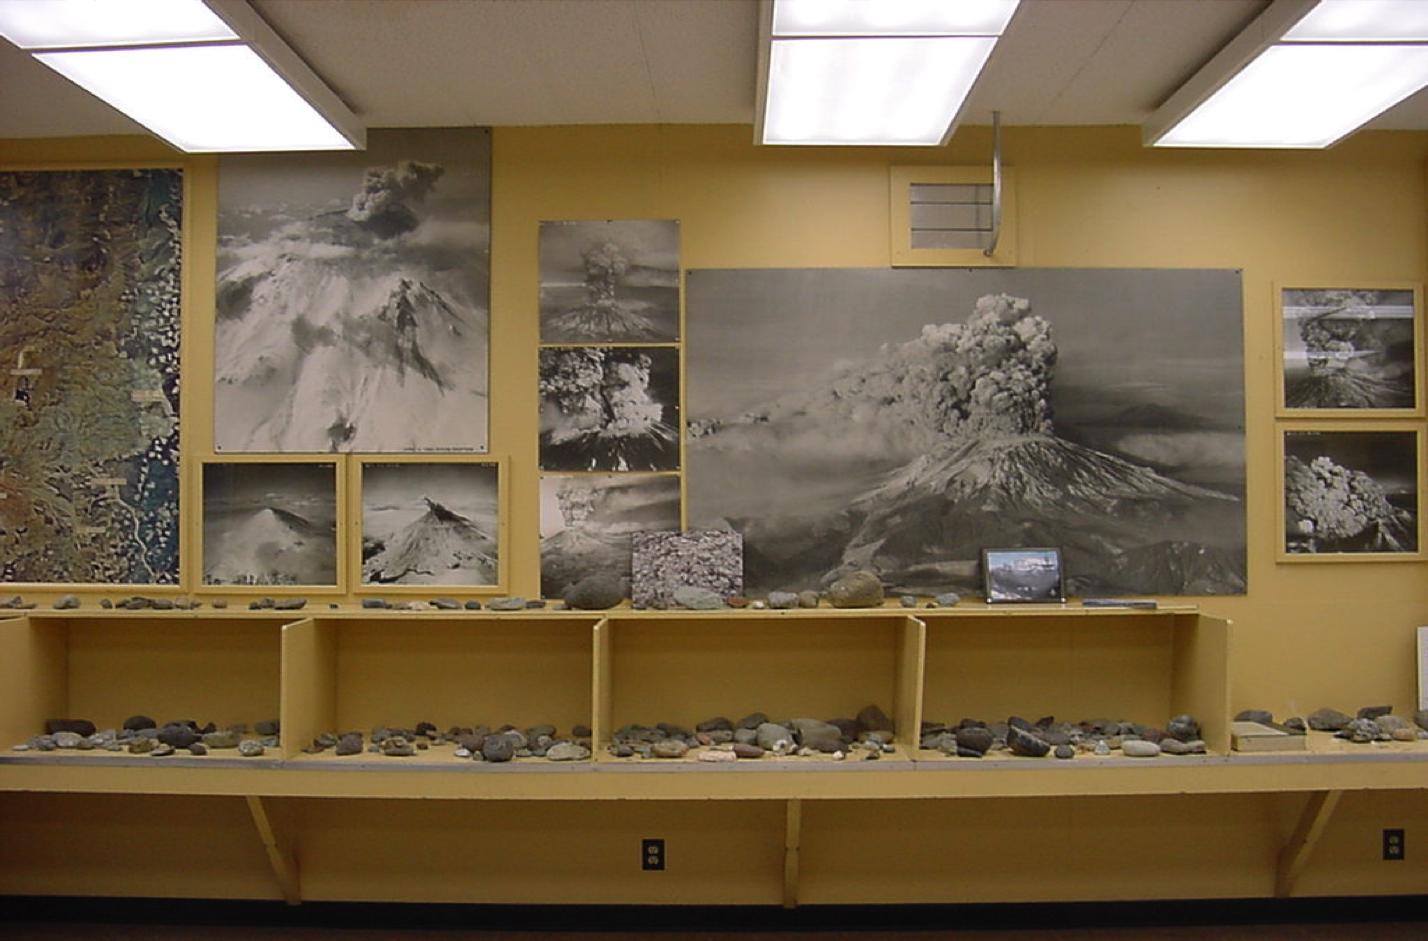 Mt. St. Helens Room